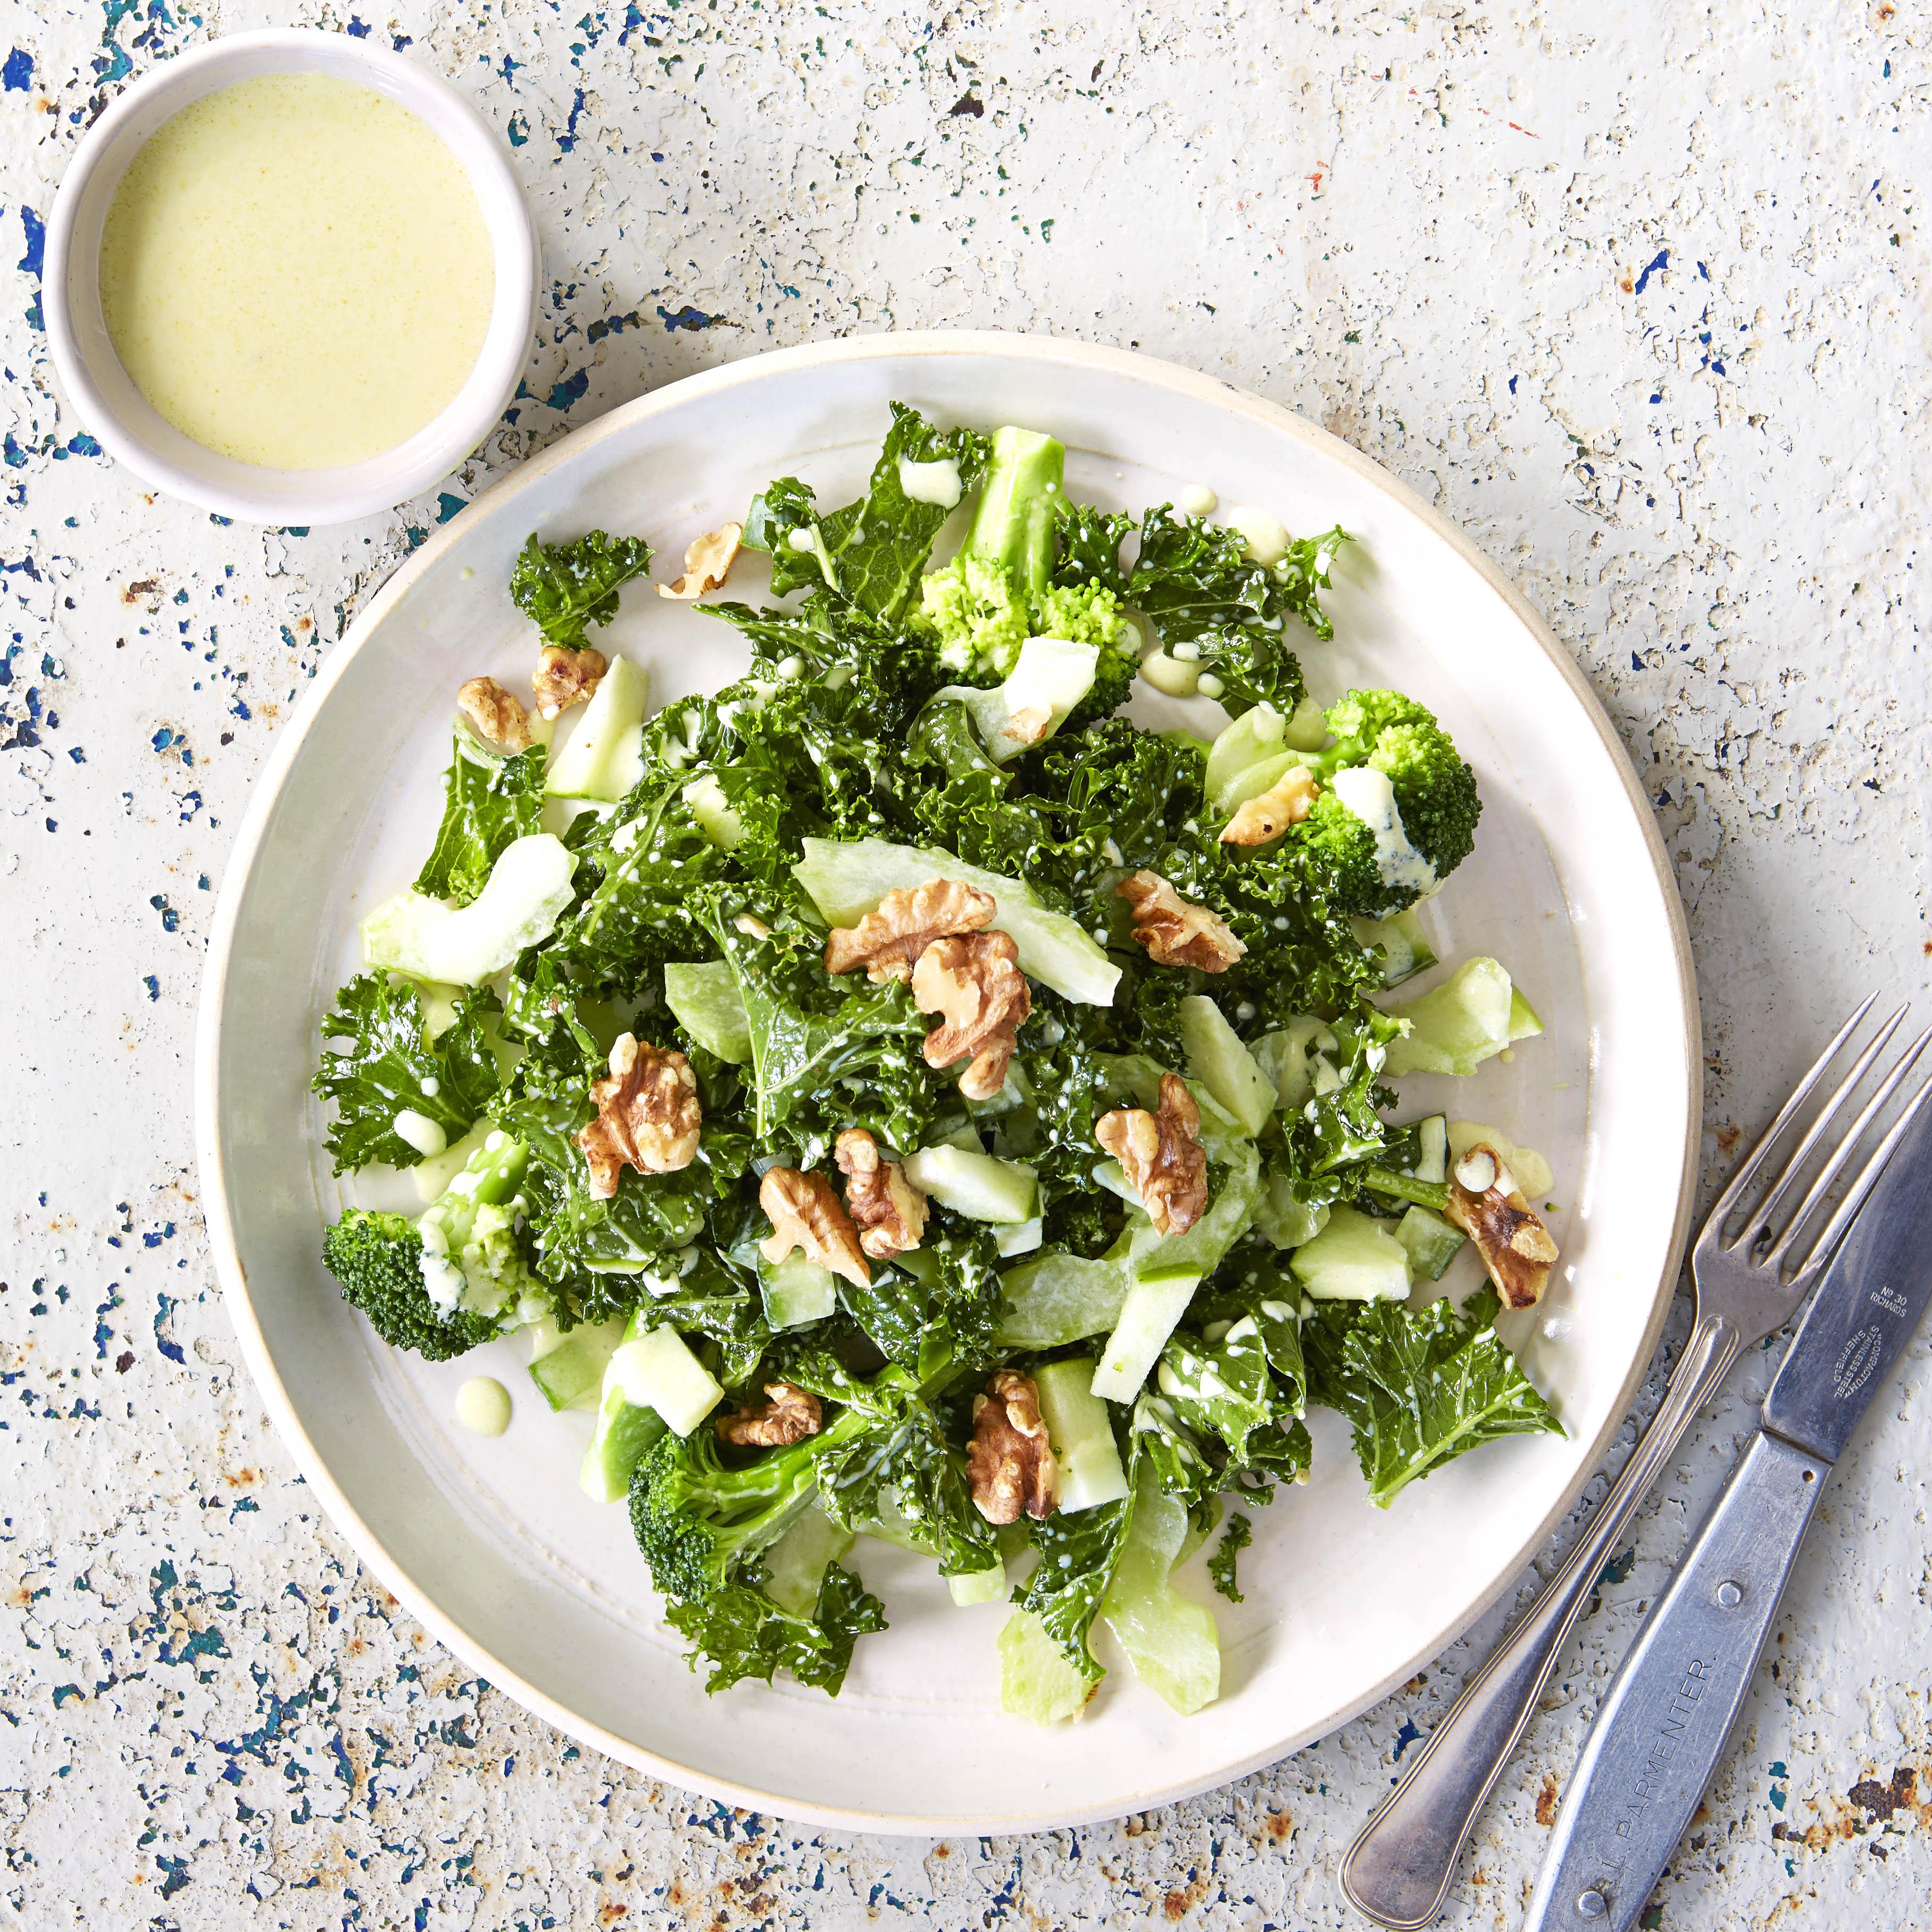 Kale and broccoli emerald salad with kefir dressing